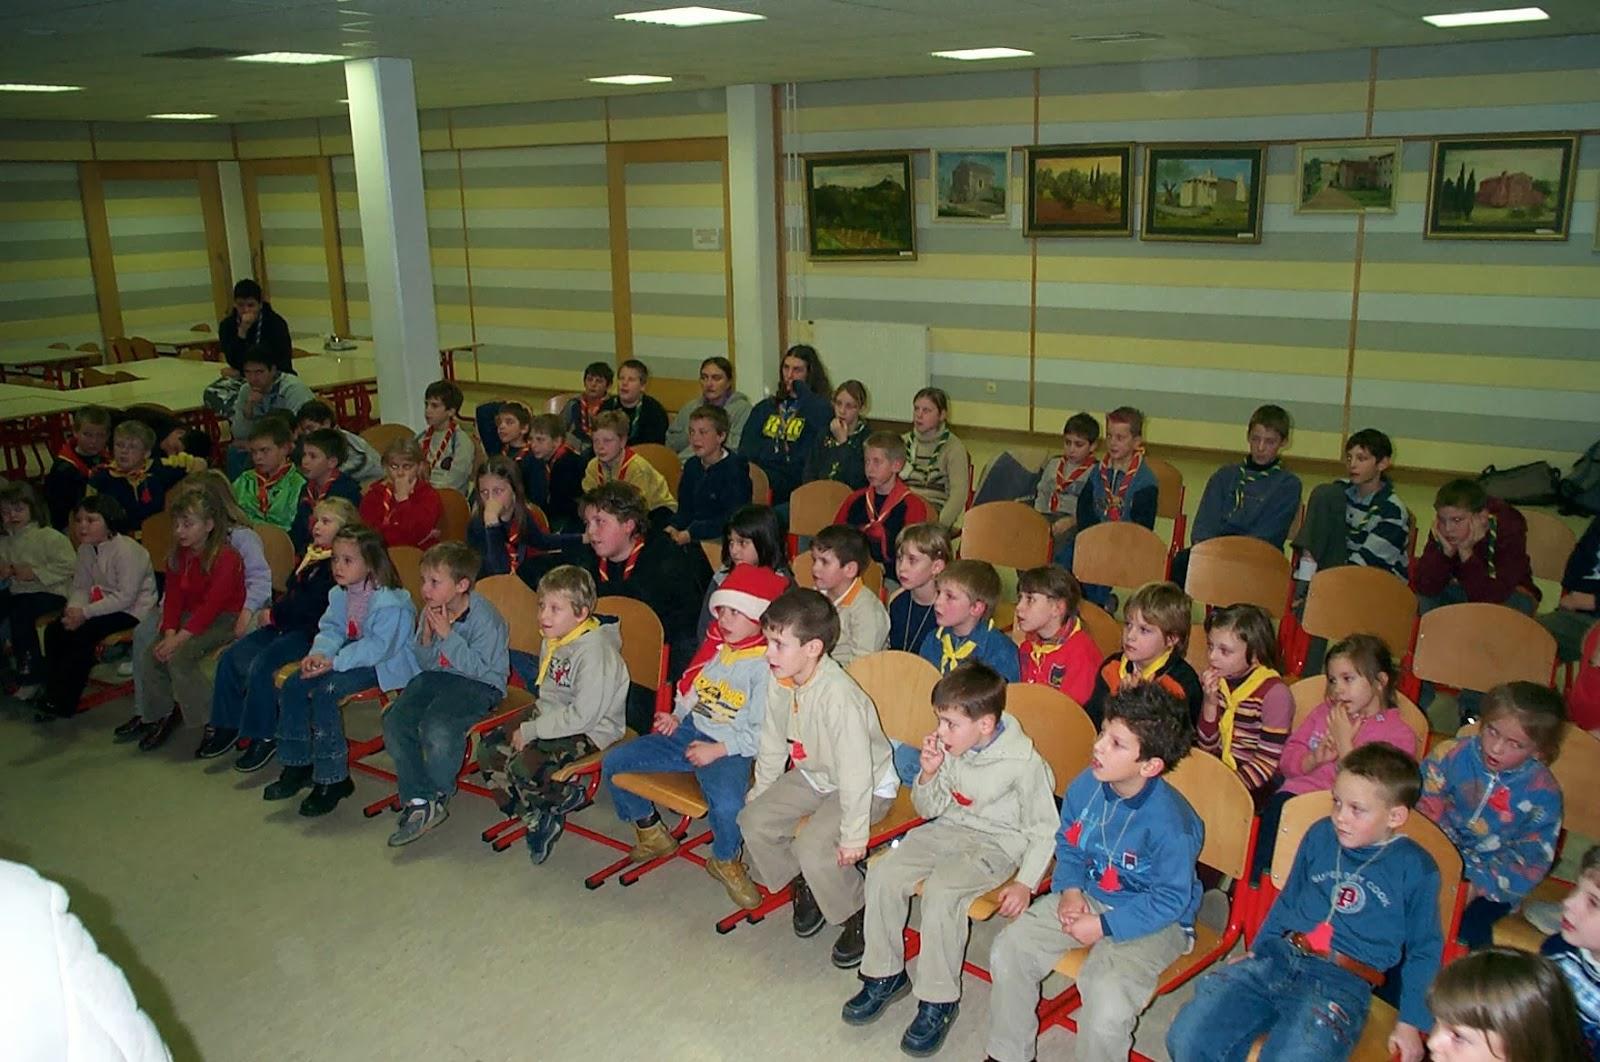 Čajanka, Ilirska Bistrica 2003 - Slika%2B041.jpg